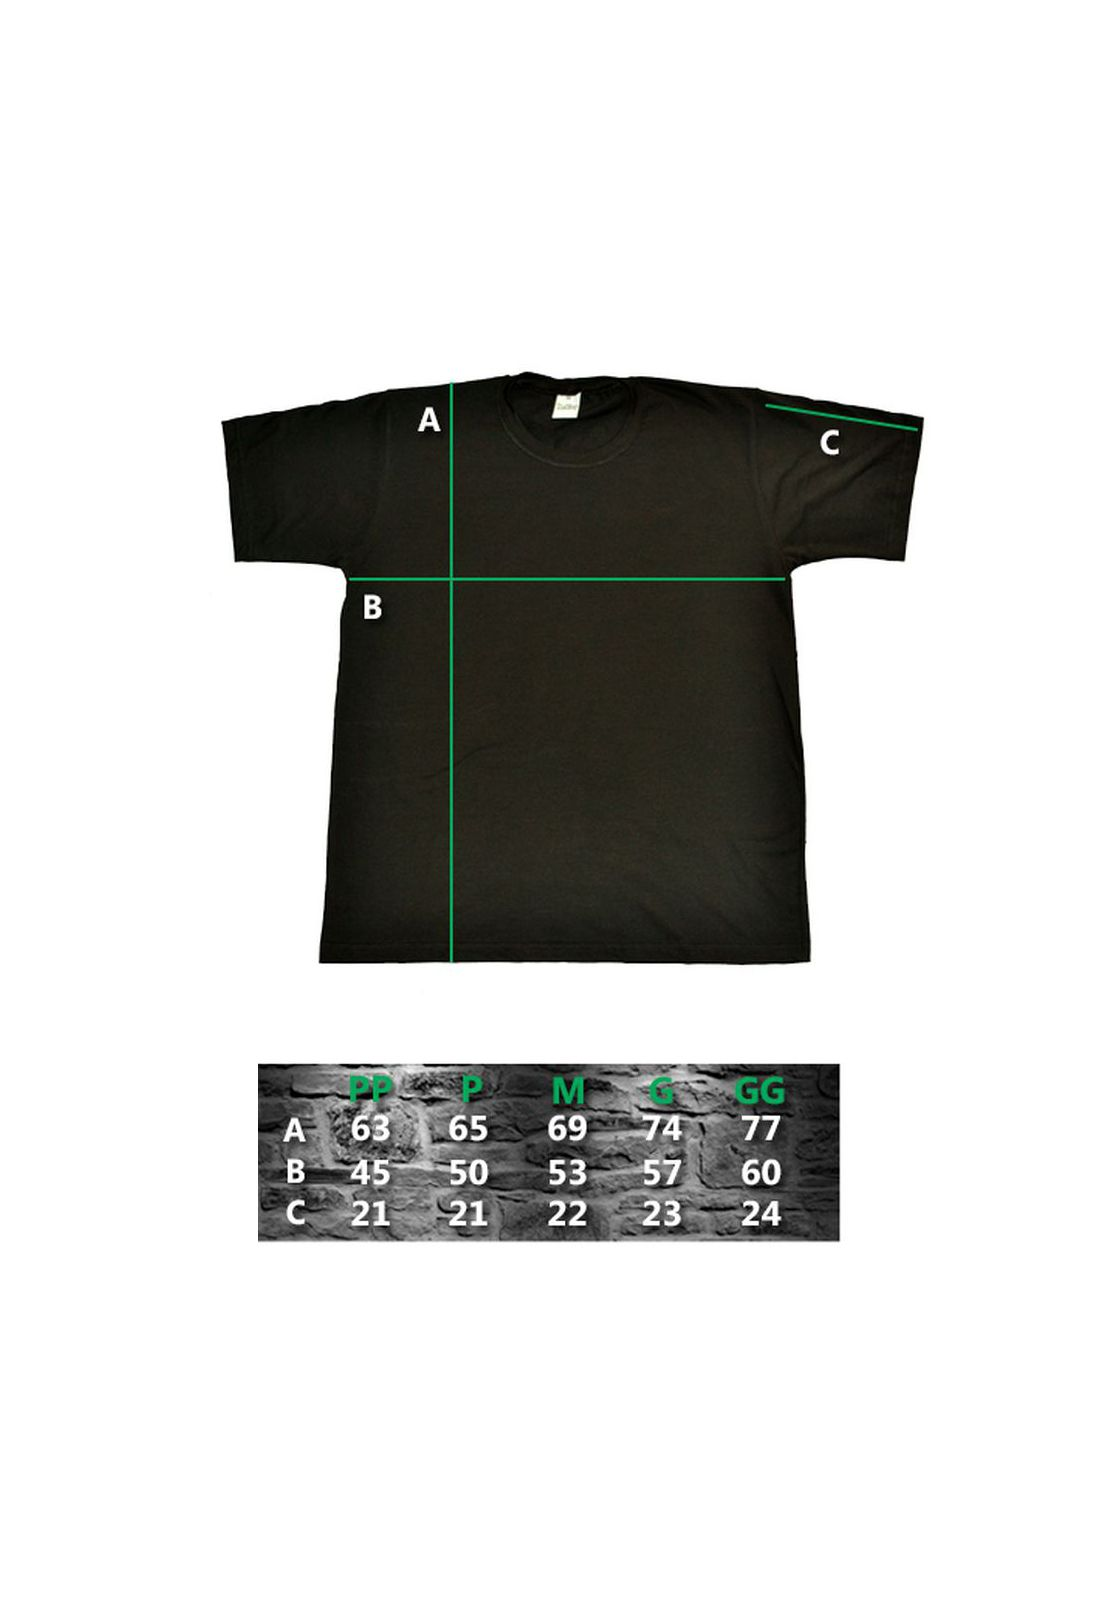 Camiseta HShop O Iluminado Preto  - HShop